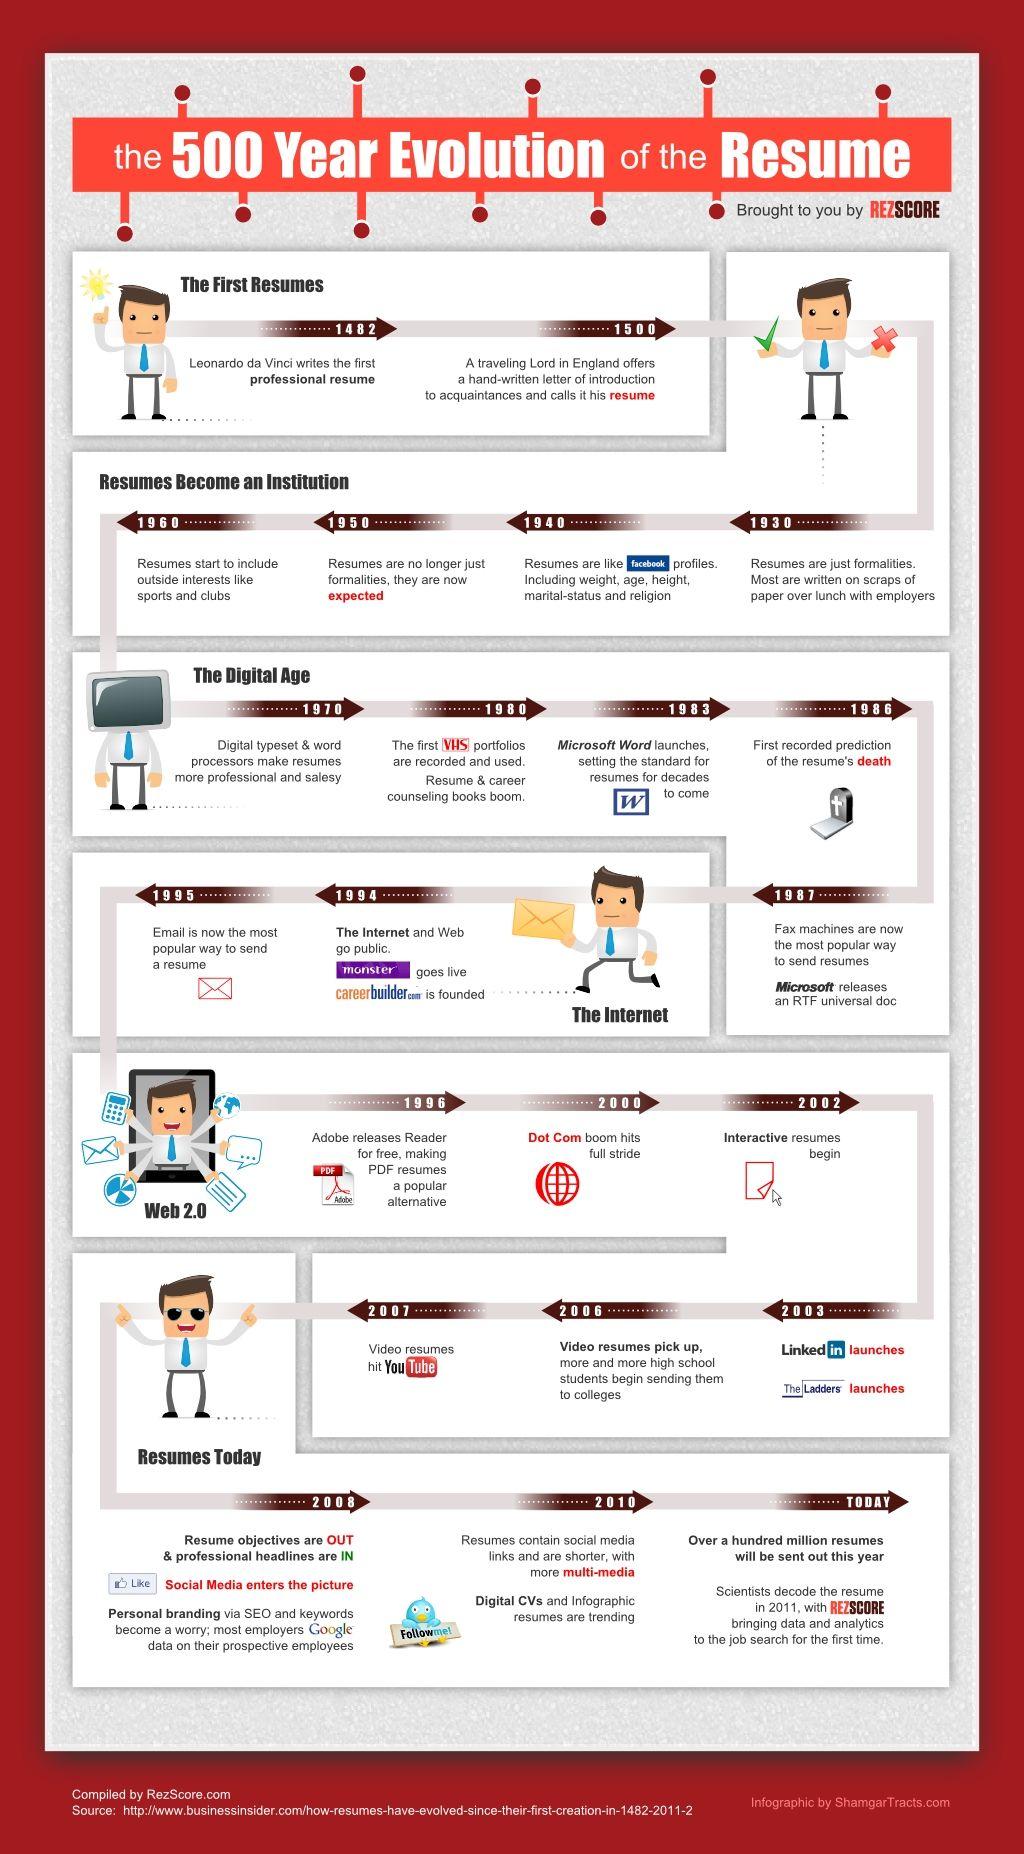 The 500-Year Evolution of the Resume | El curriculum vitae ...